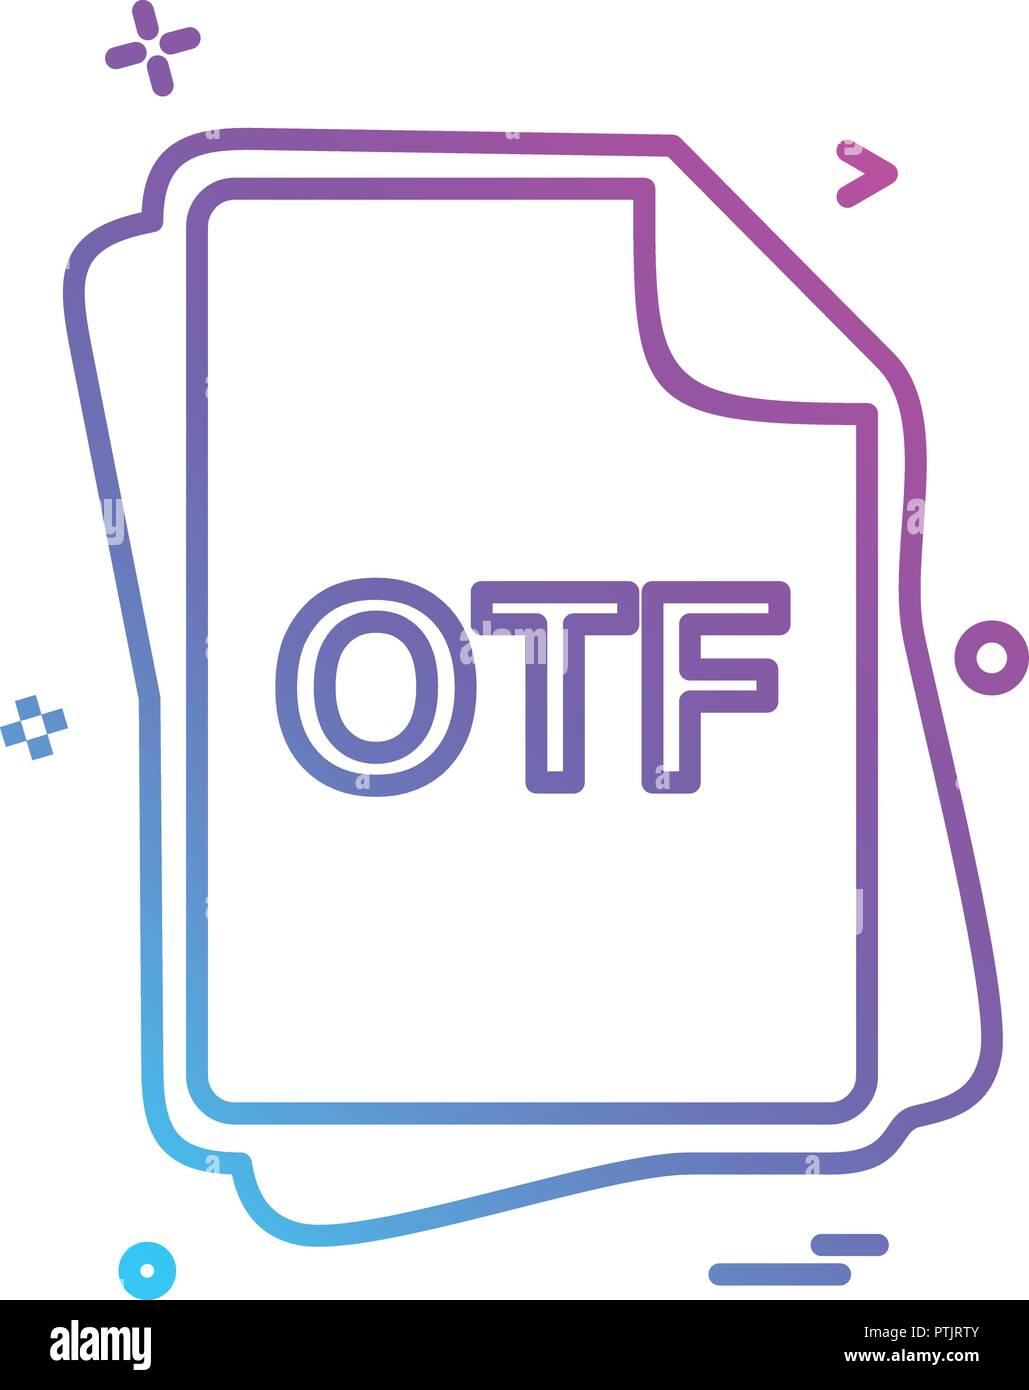 Otf Stock Photos & Otf Stock Images - Page 2 - Alamy